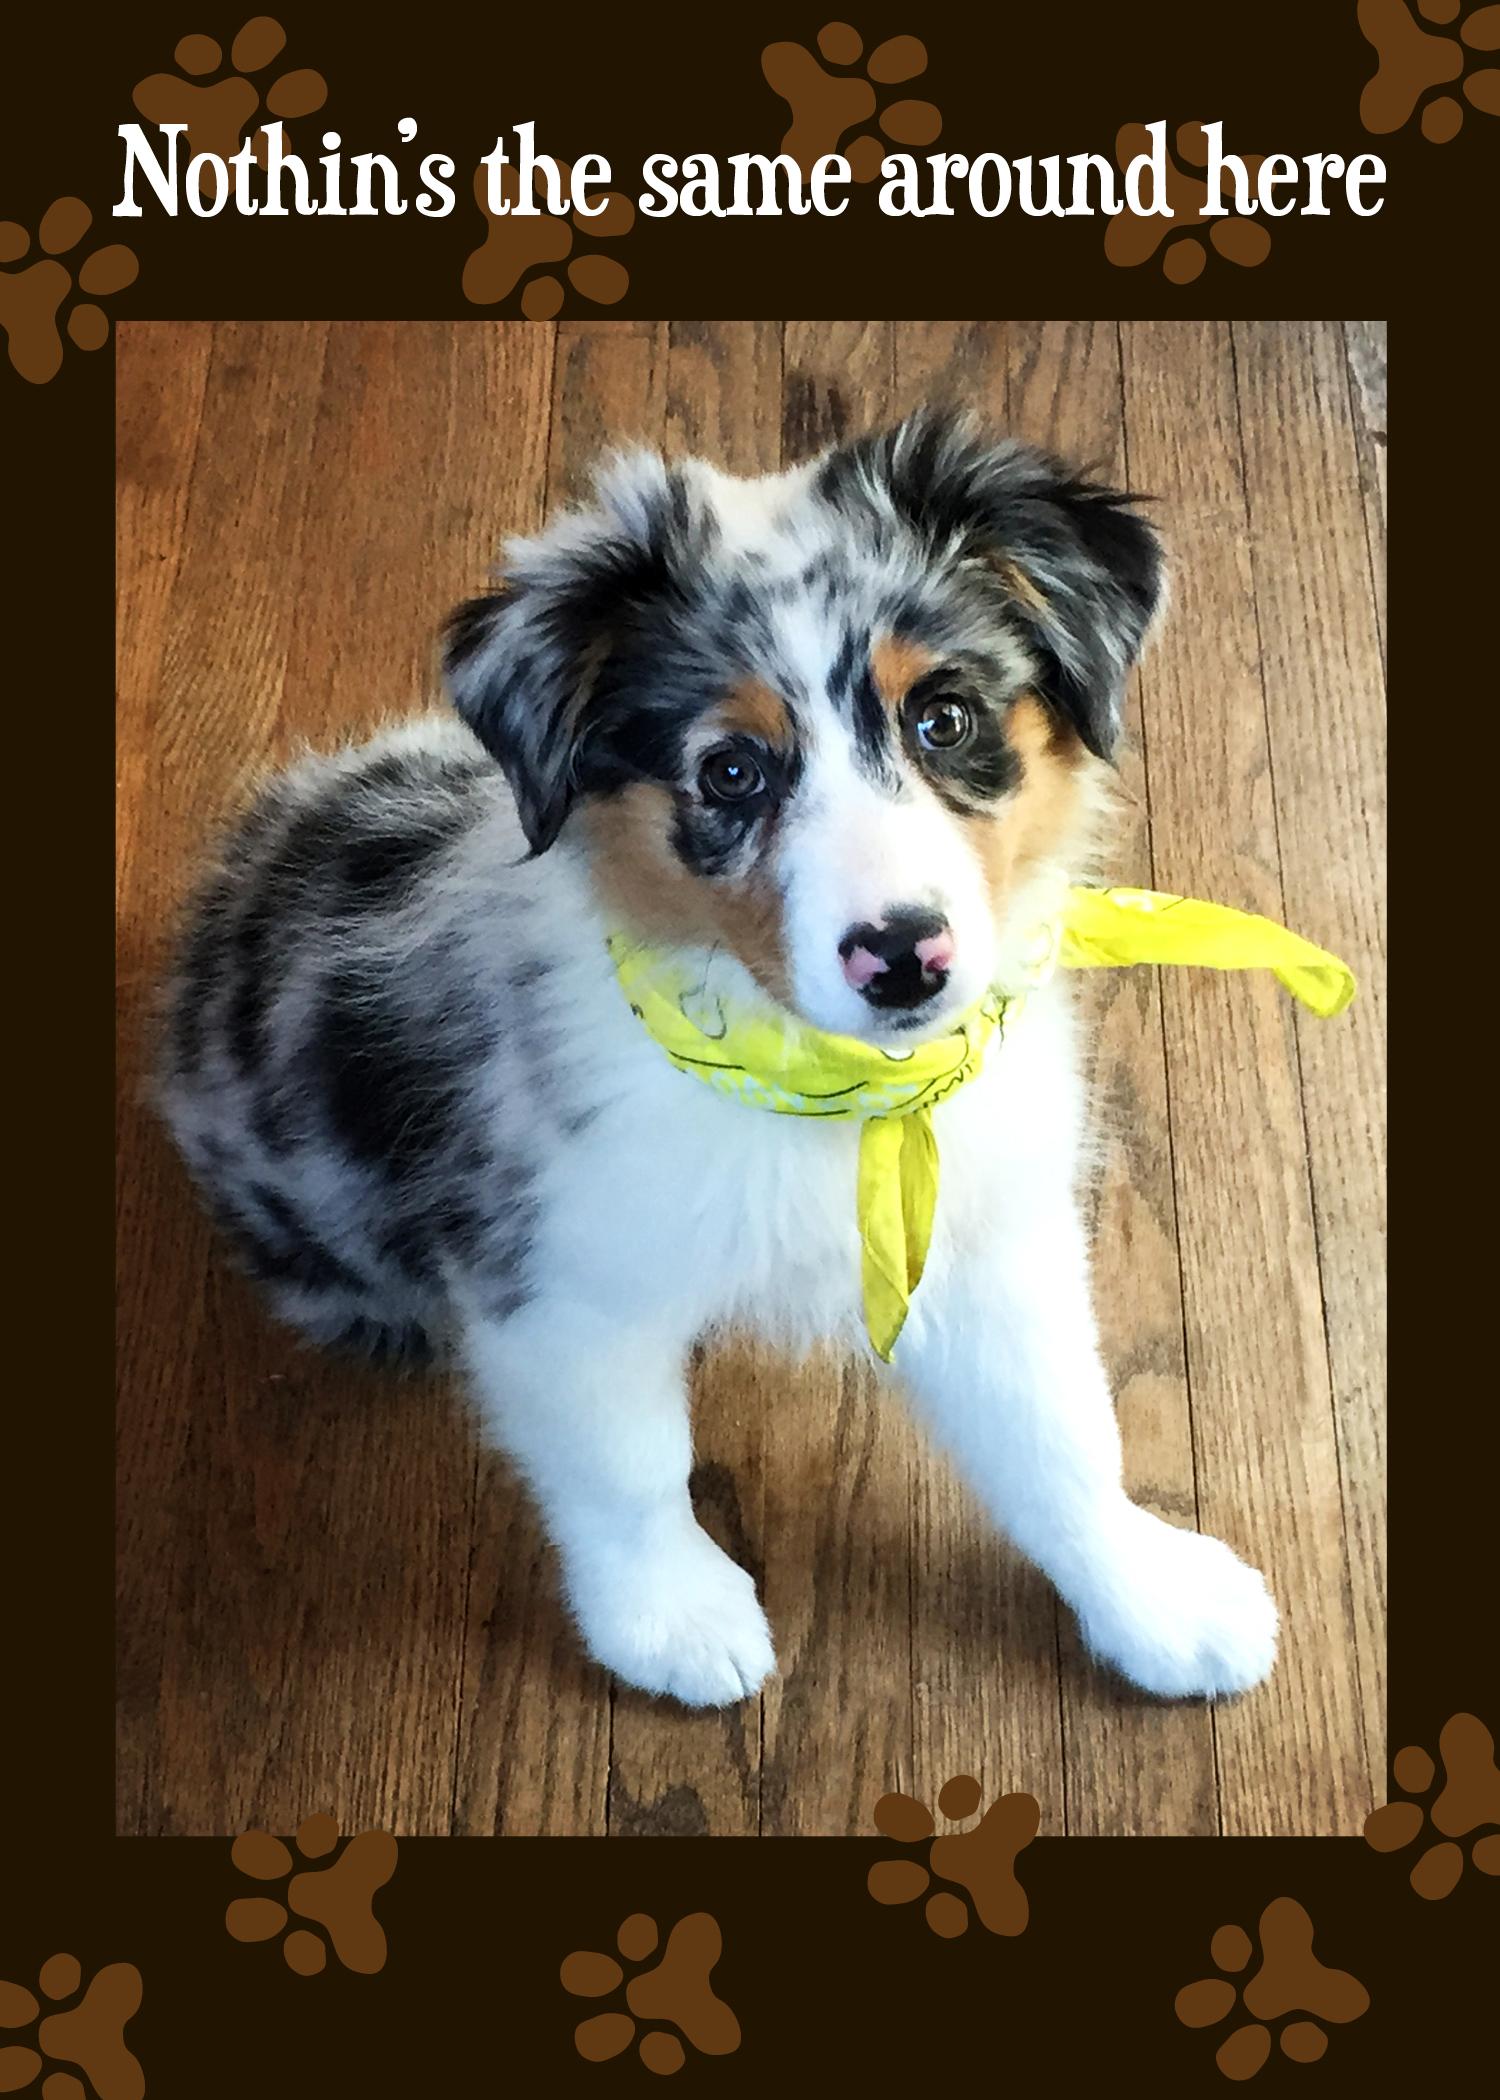 Get Well Card Feel Better Australian Shepherd Puppy